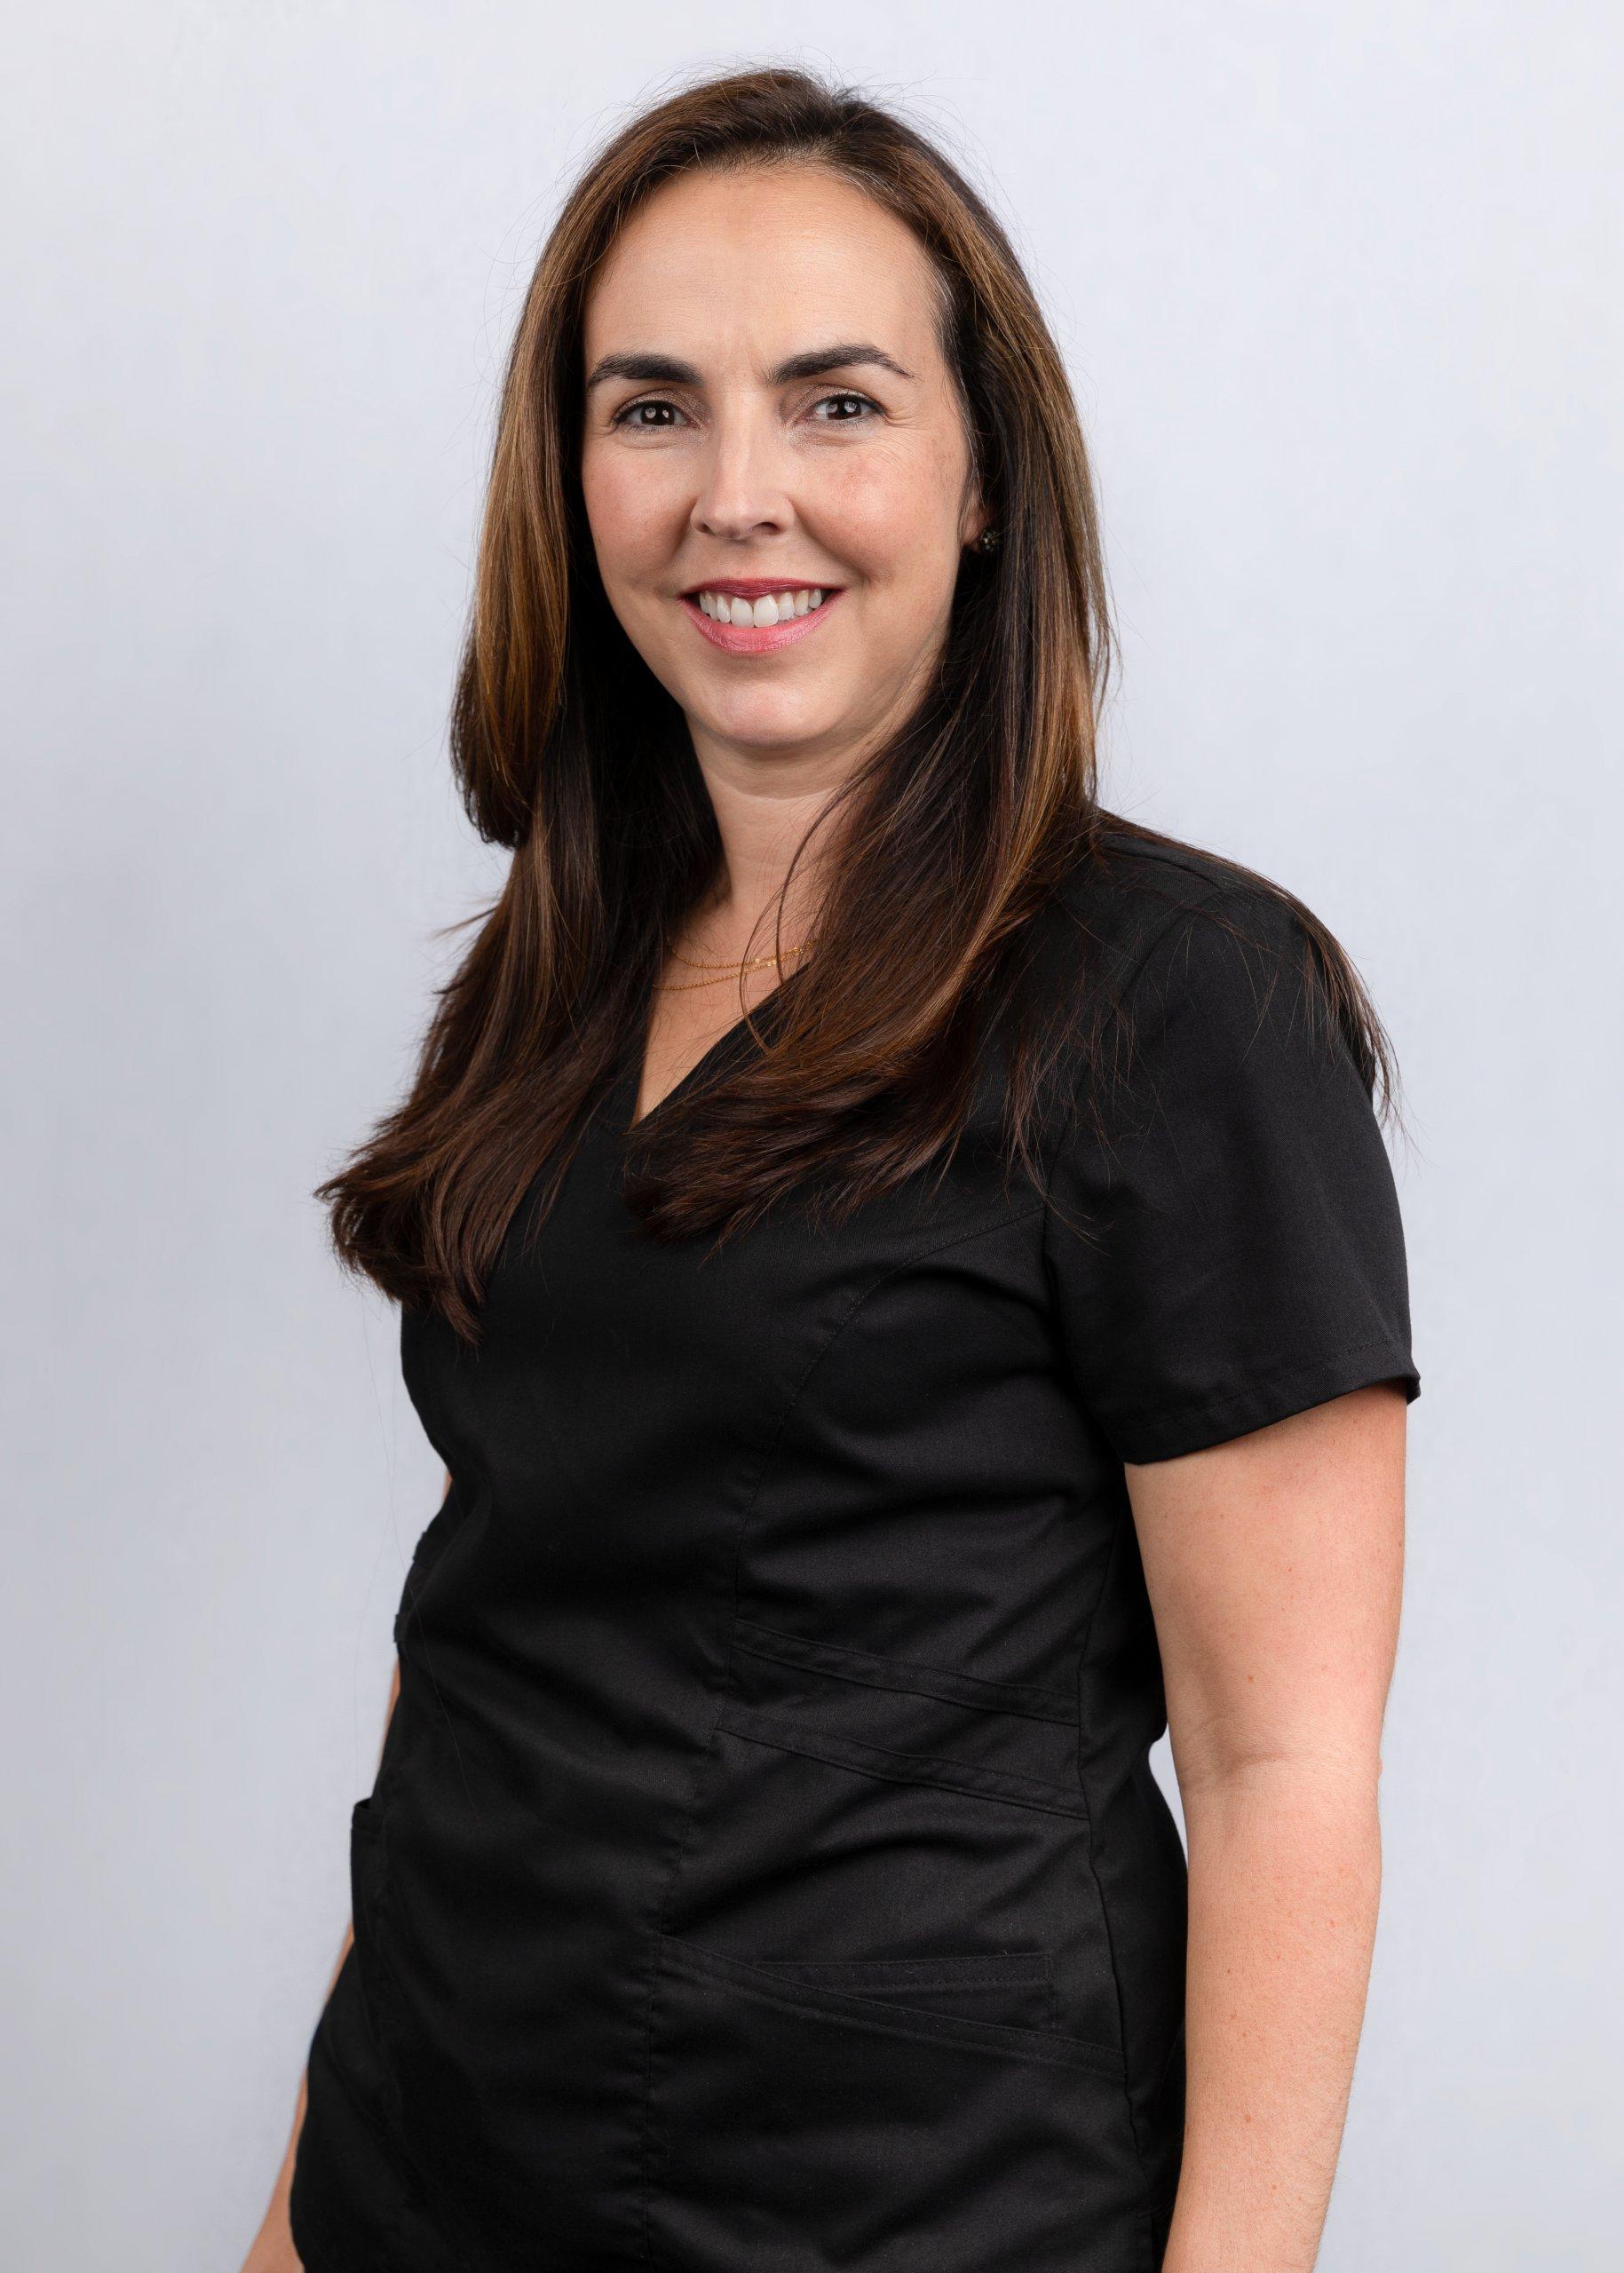 Melisse Conway, DVM